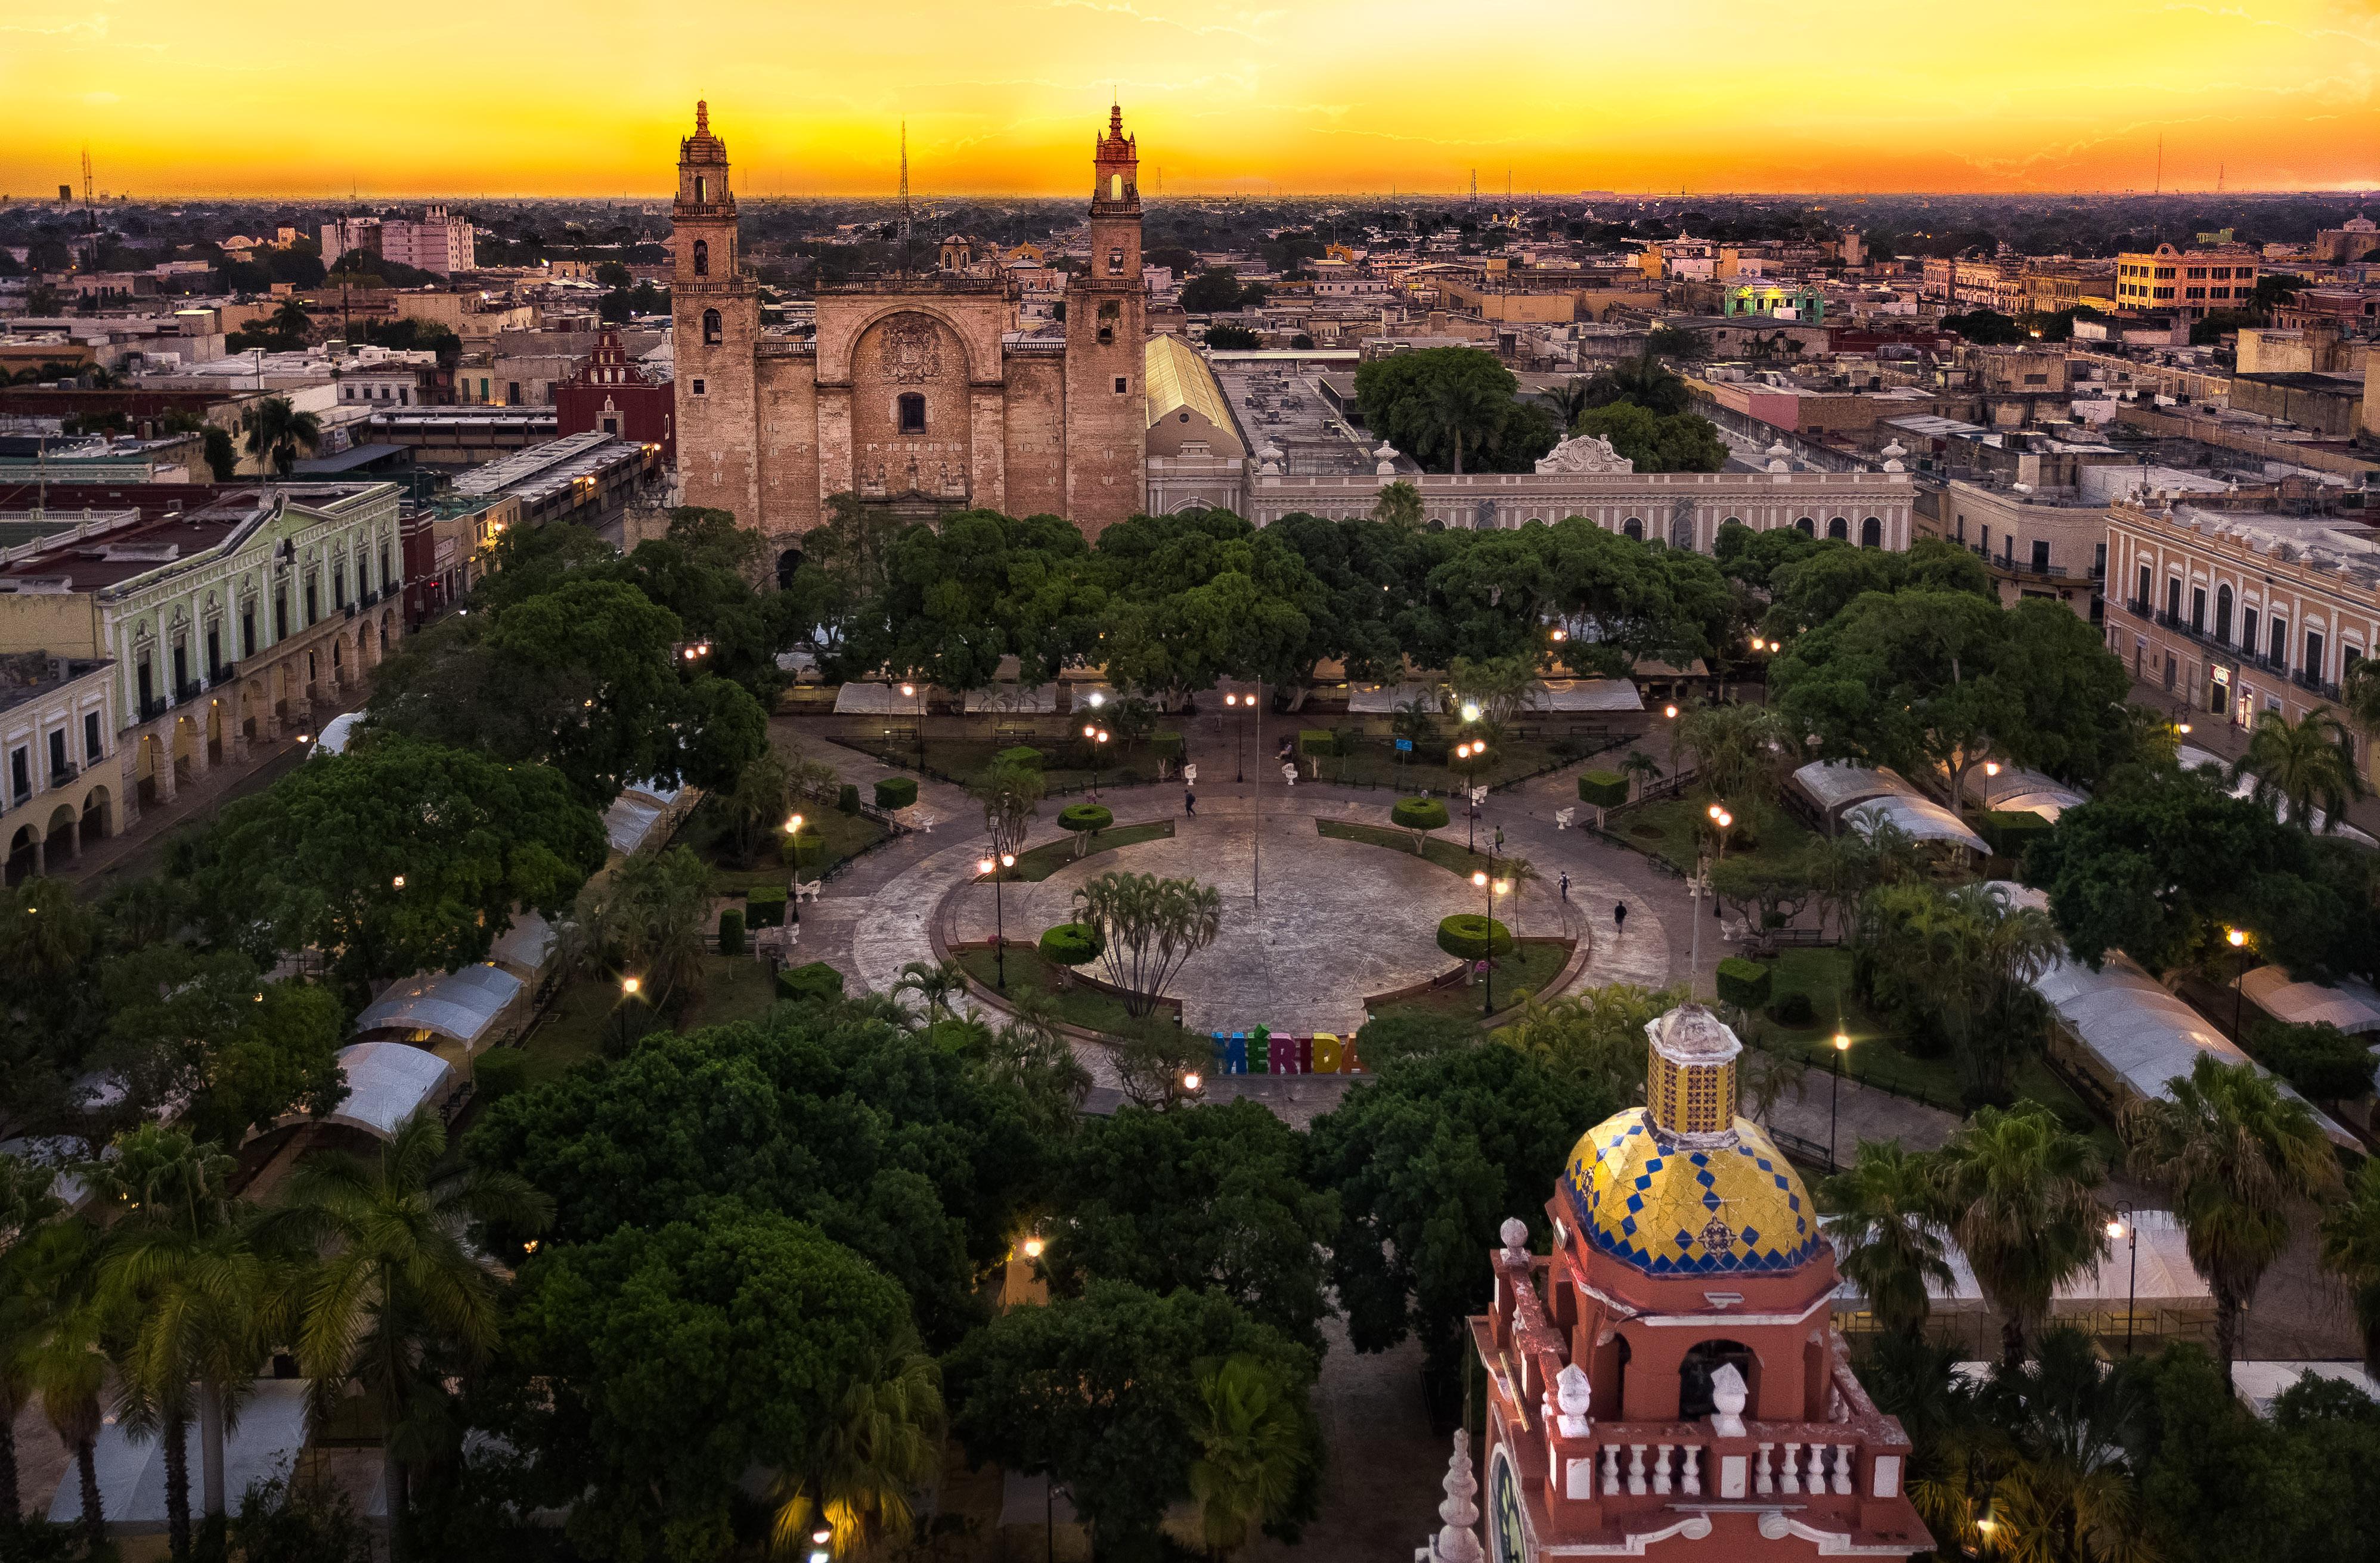 Summer Program - Spanish | CIEE High School Summer Abroad: Spanish Language & Mexican Culture in Merida, Mexico